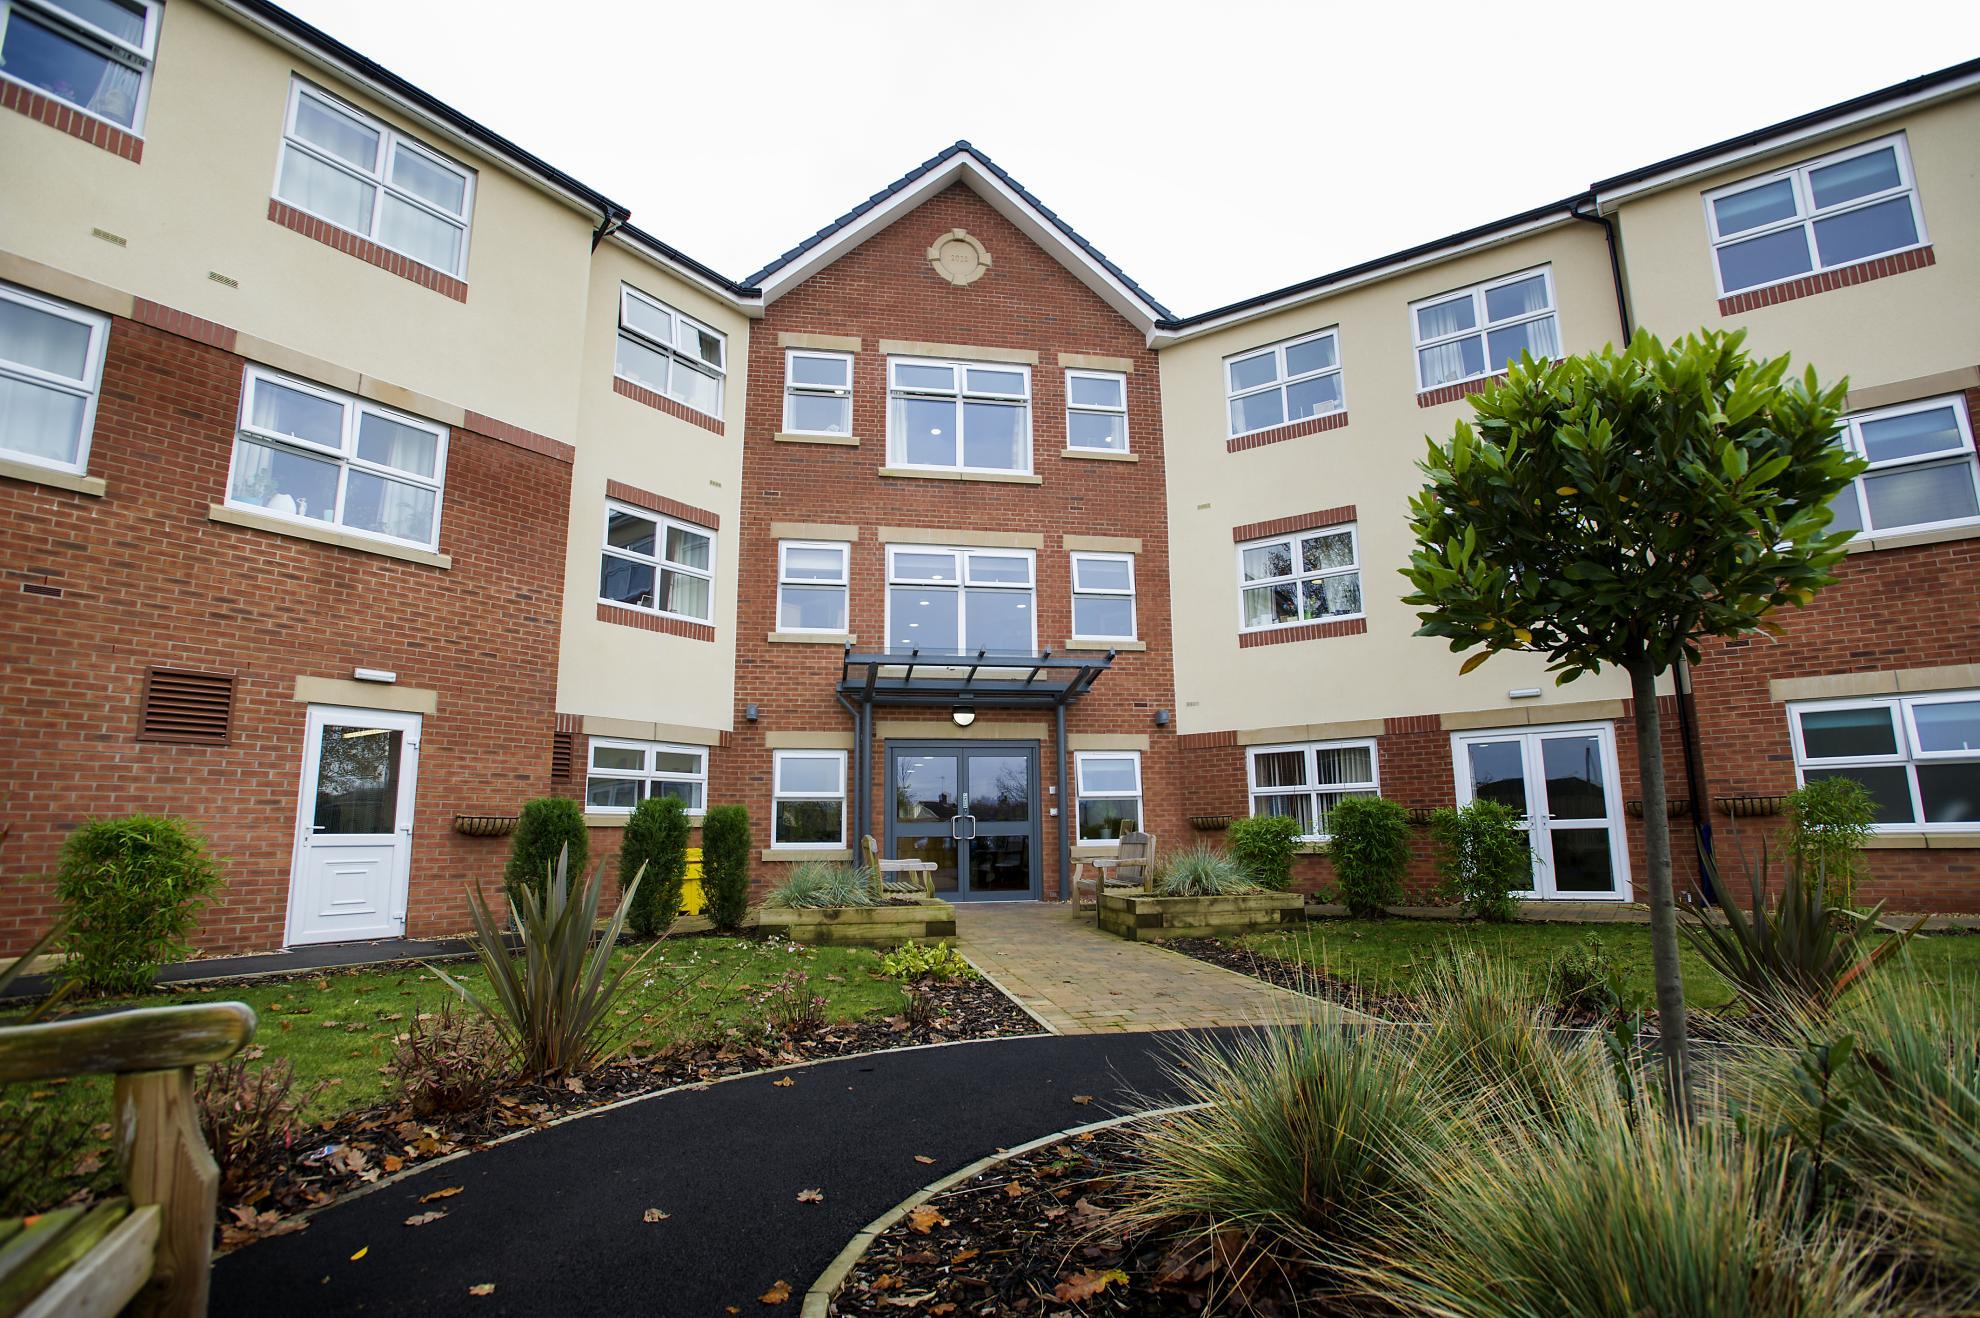 Field House Residential Care Home Stourbridge